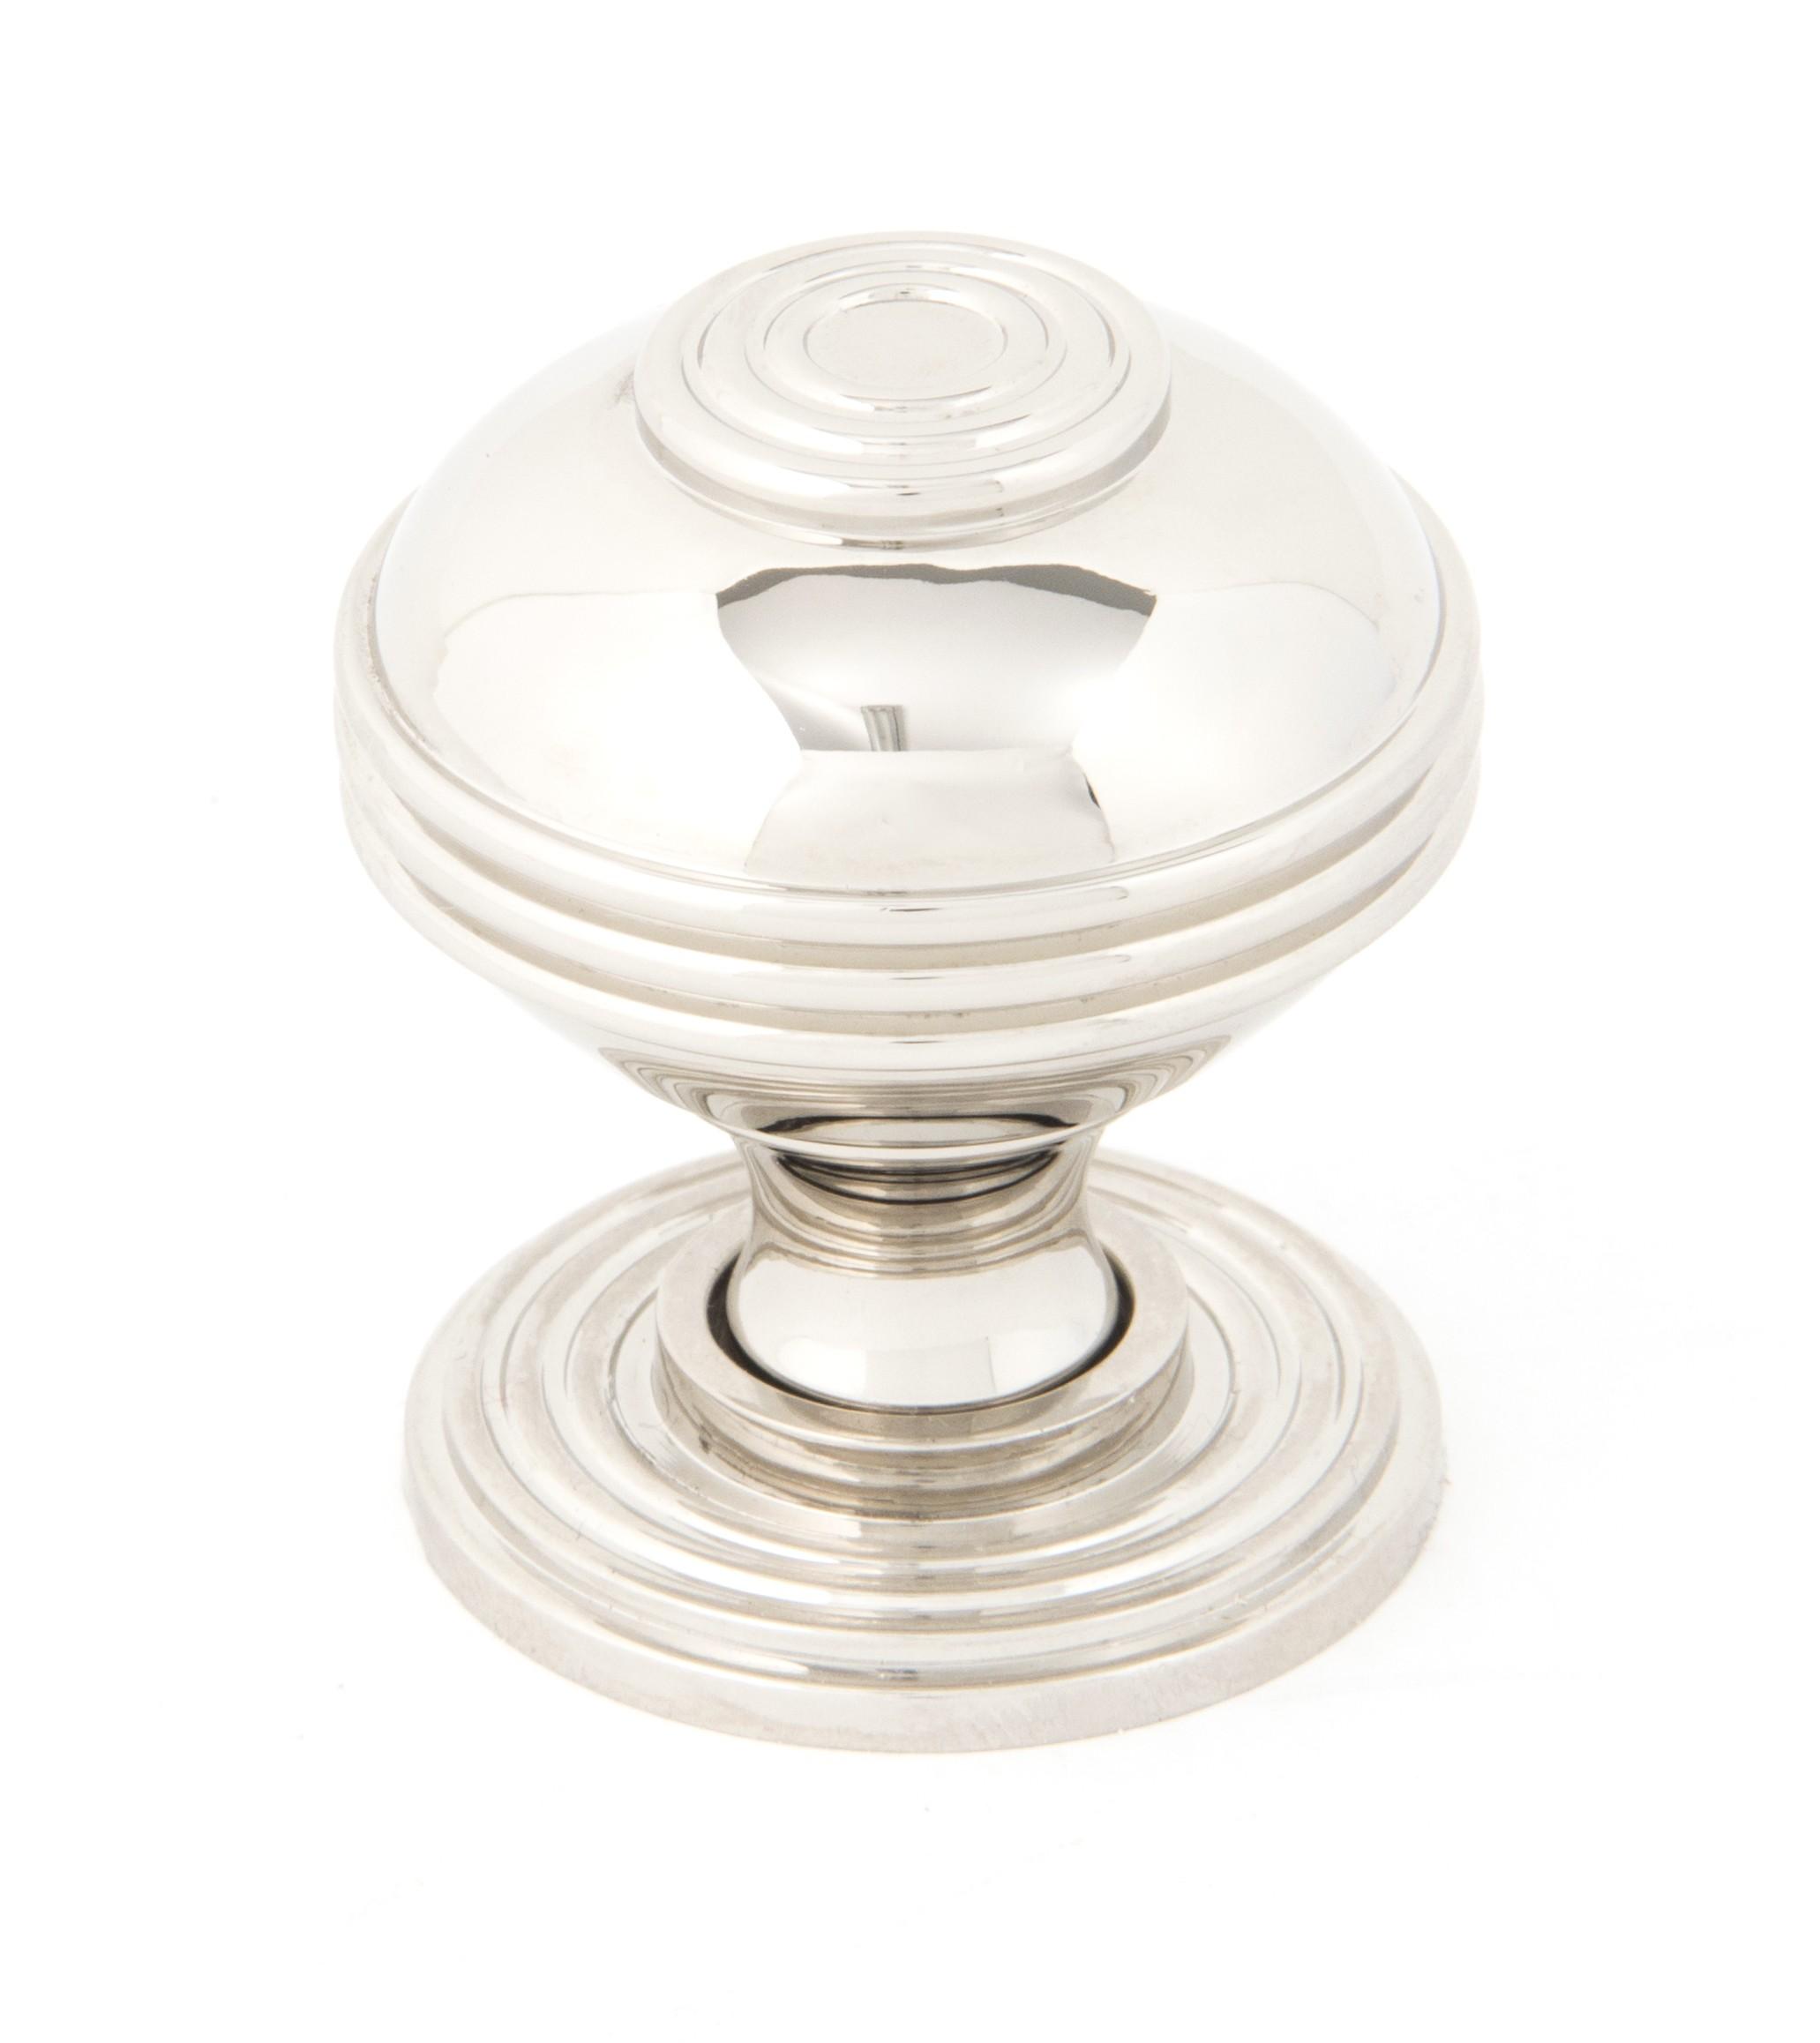 ANVIL - Polished Nickel Prestbury Cabinet Knob - Large